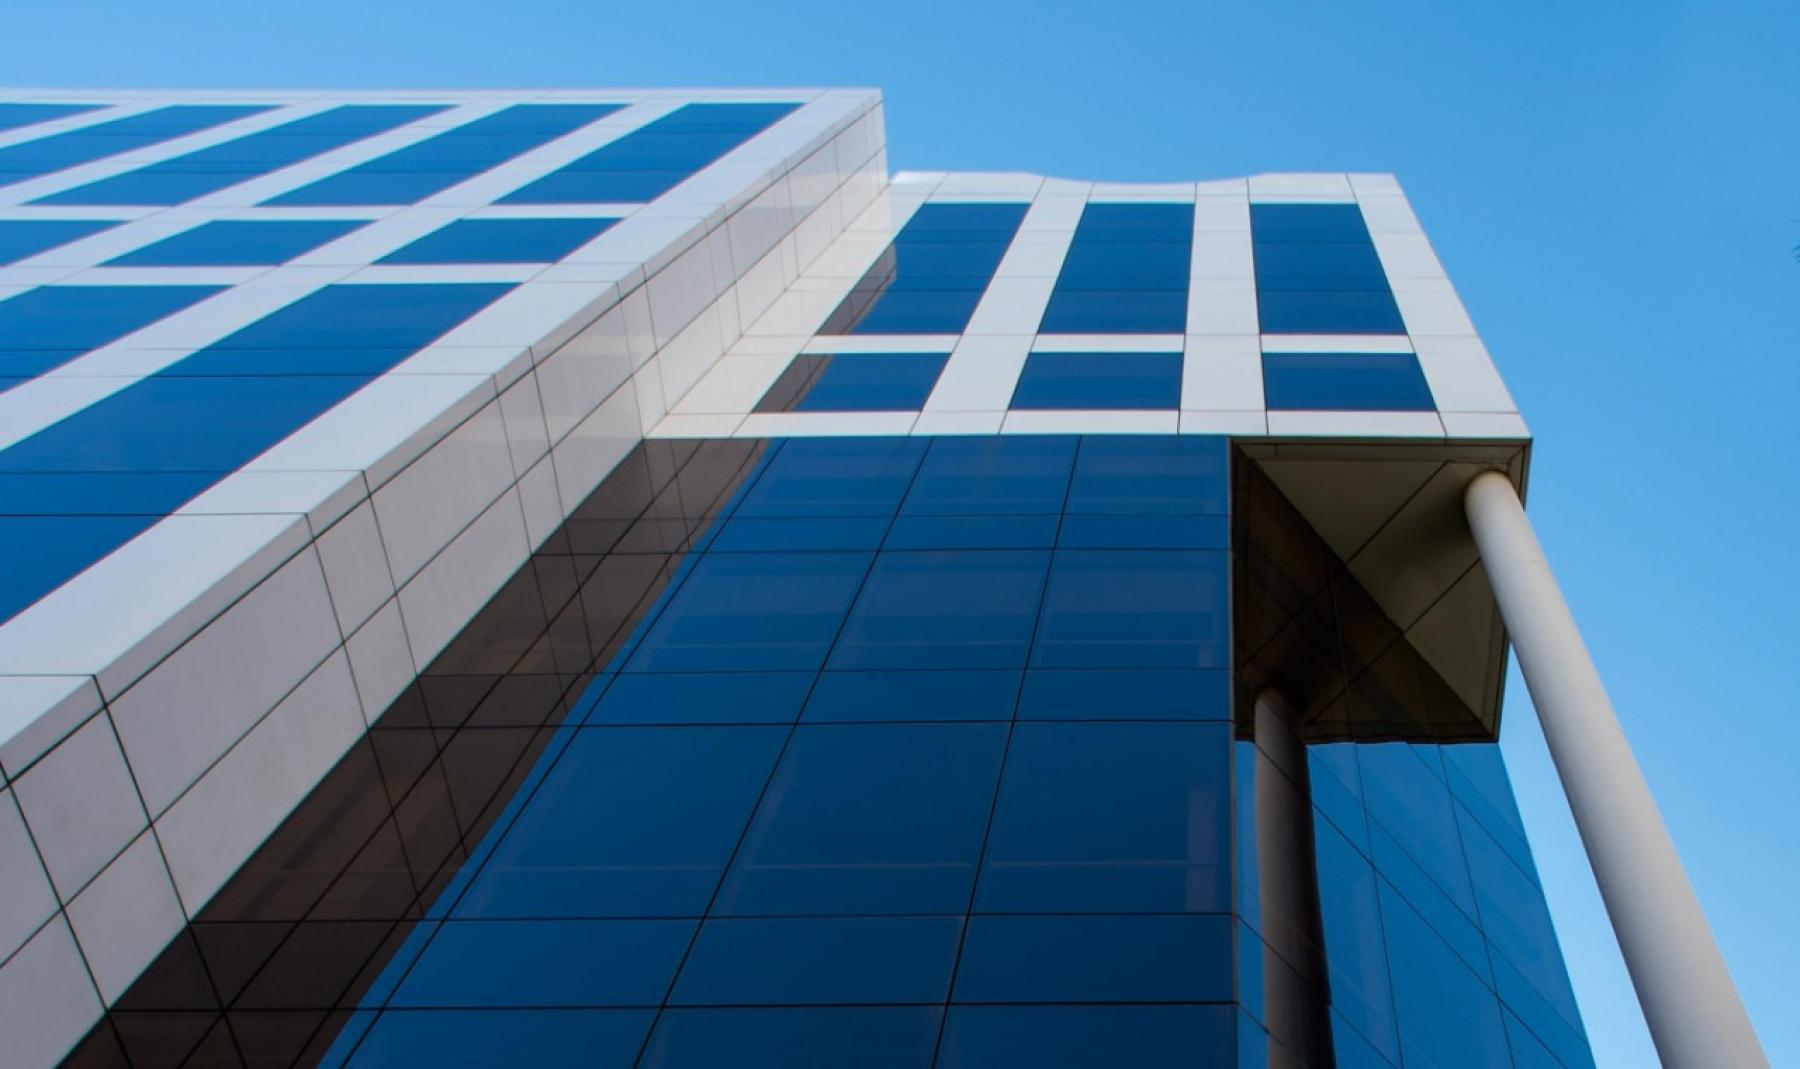 Alquilar oficinas Diagonal , Barcelona (9)